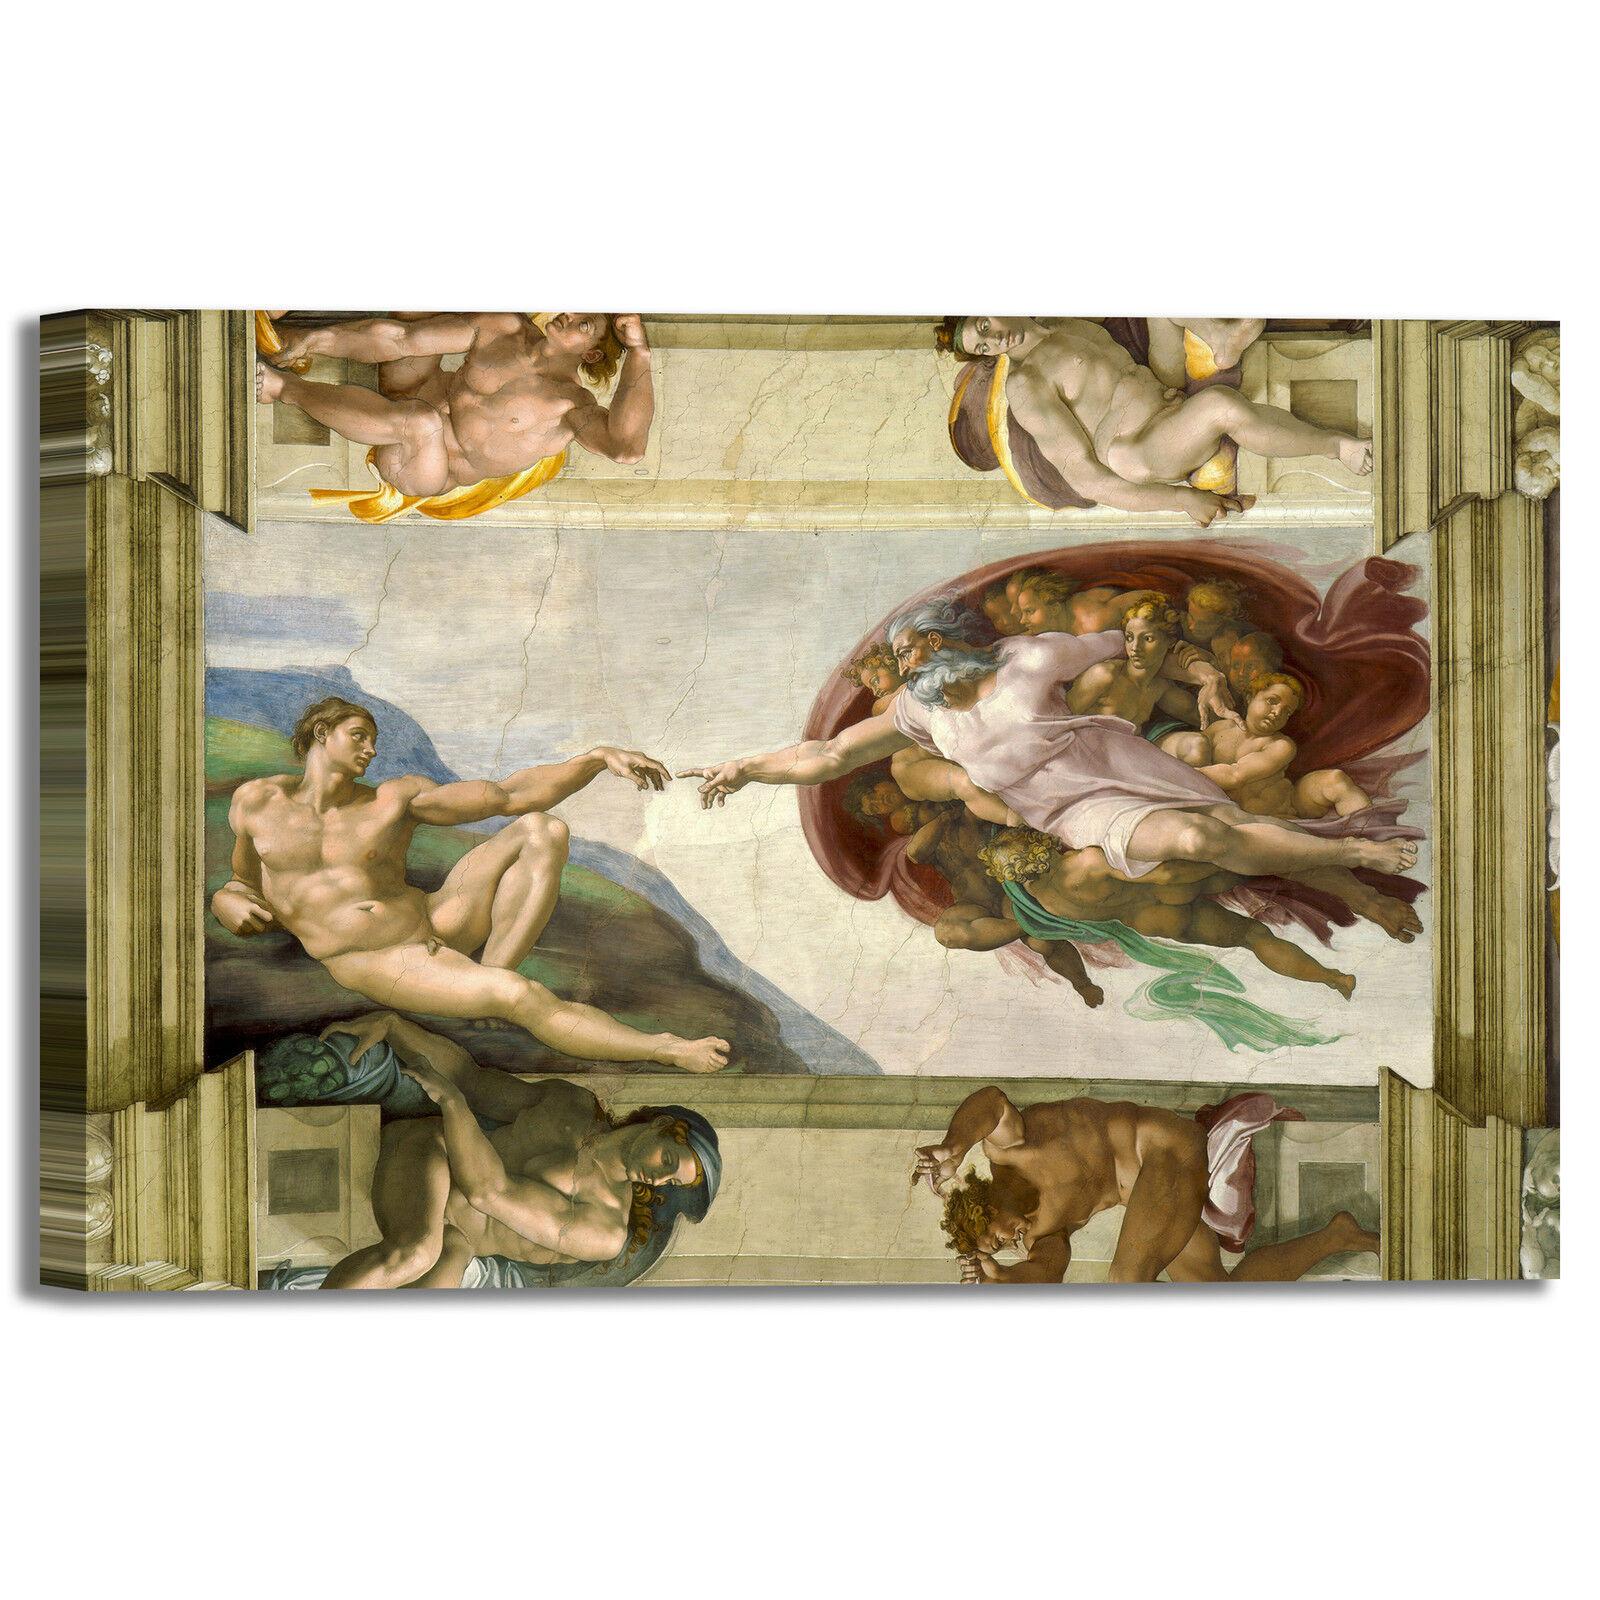 Michelangelo soffitto Cappella Sistina quadro stampa tela dipinto telaio arrossoo